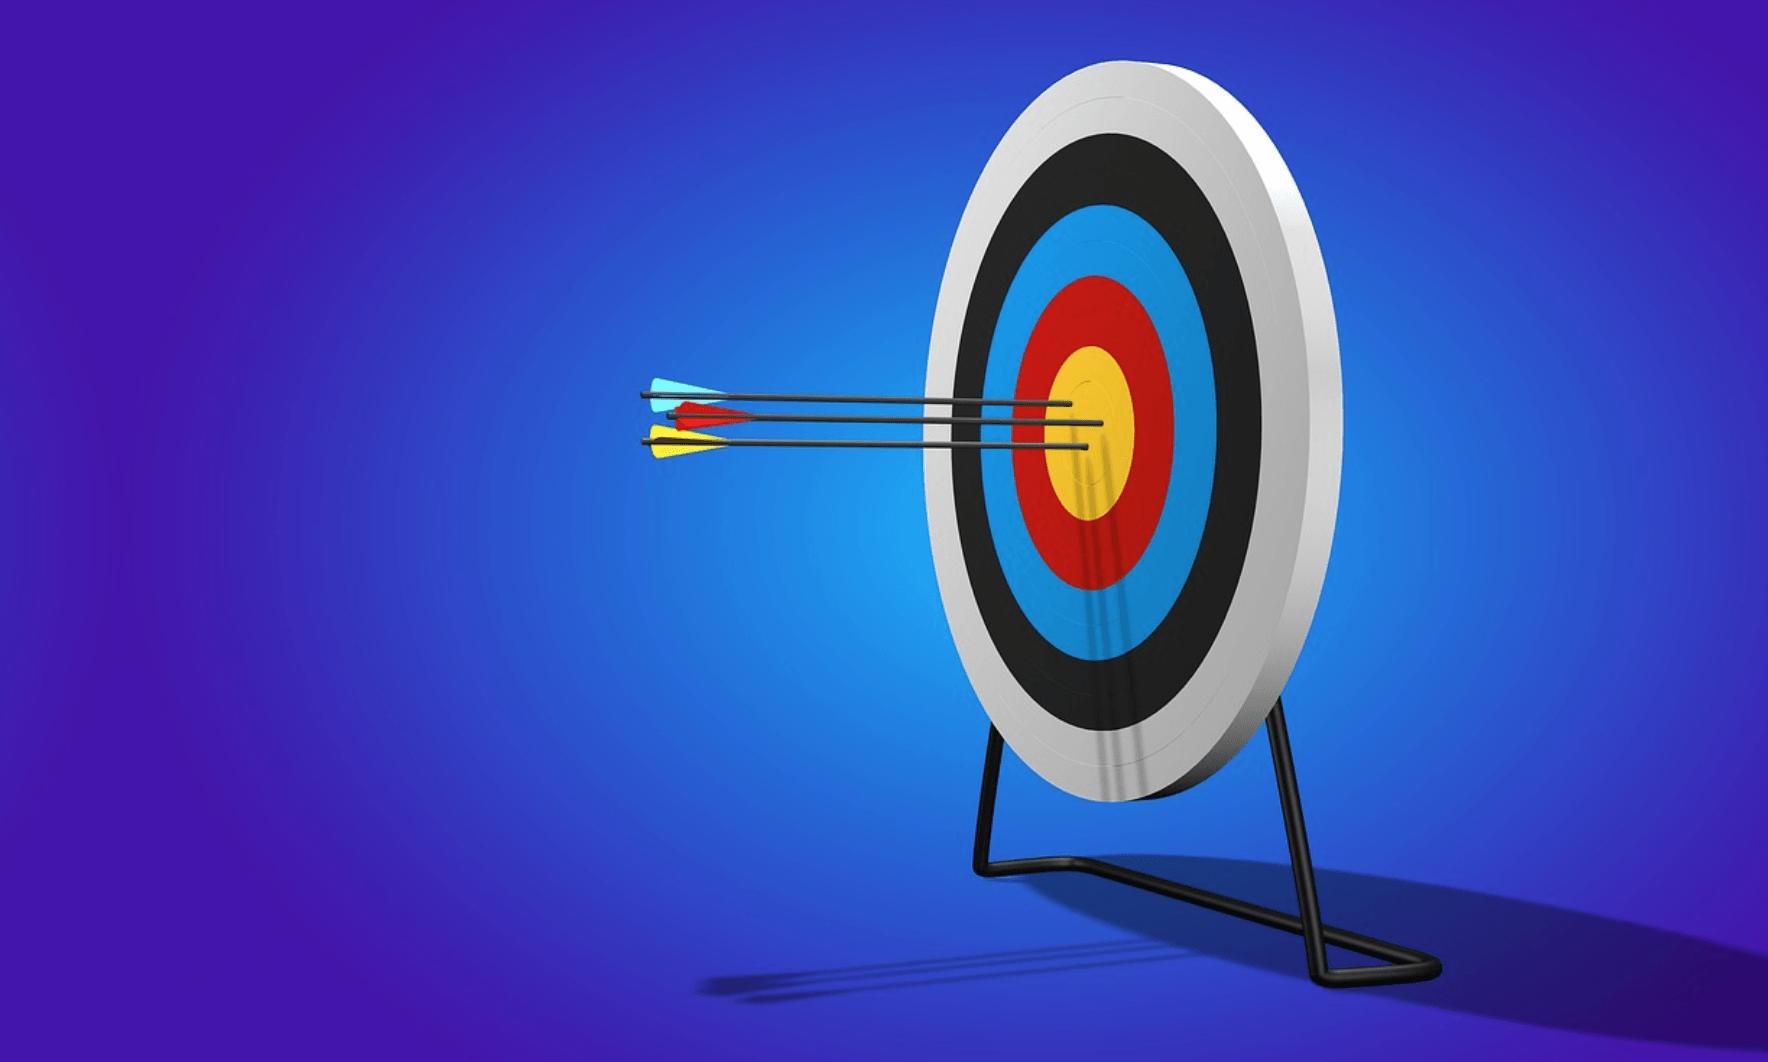 Target goals image from https://pixabay.com/en/arrow-target-range-bullseye-sport-2889040/